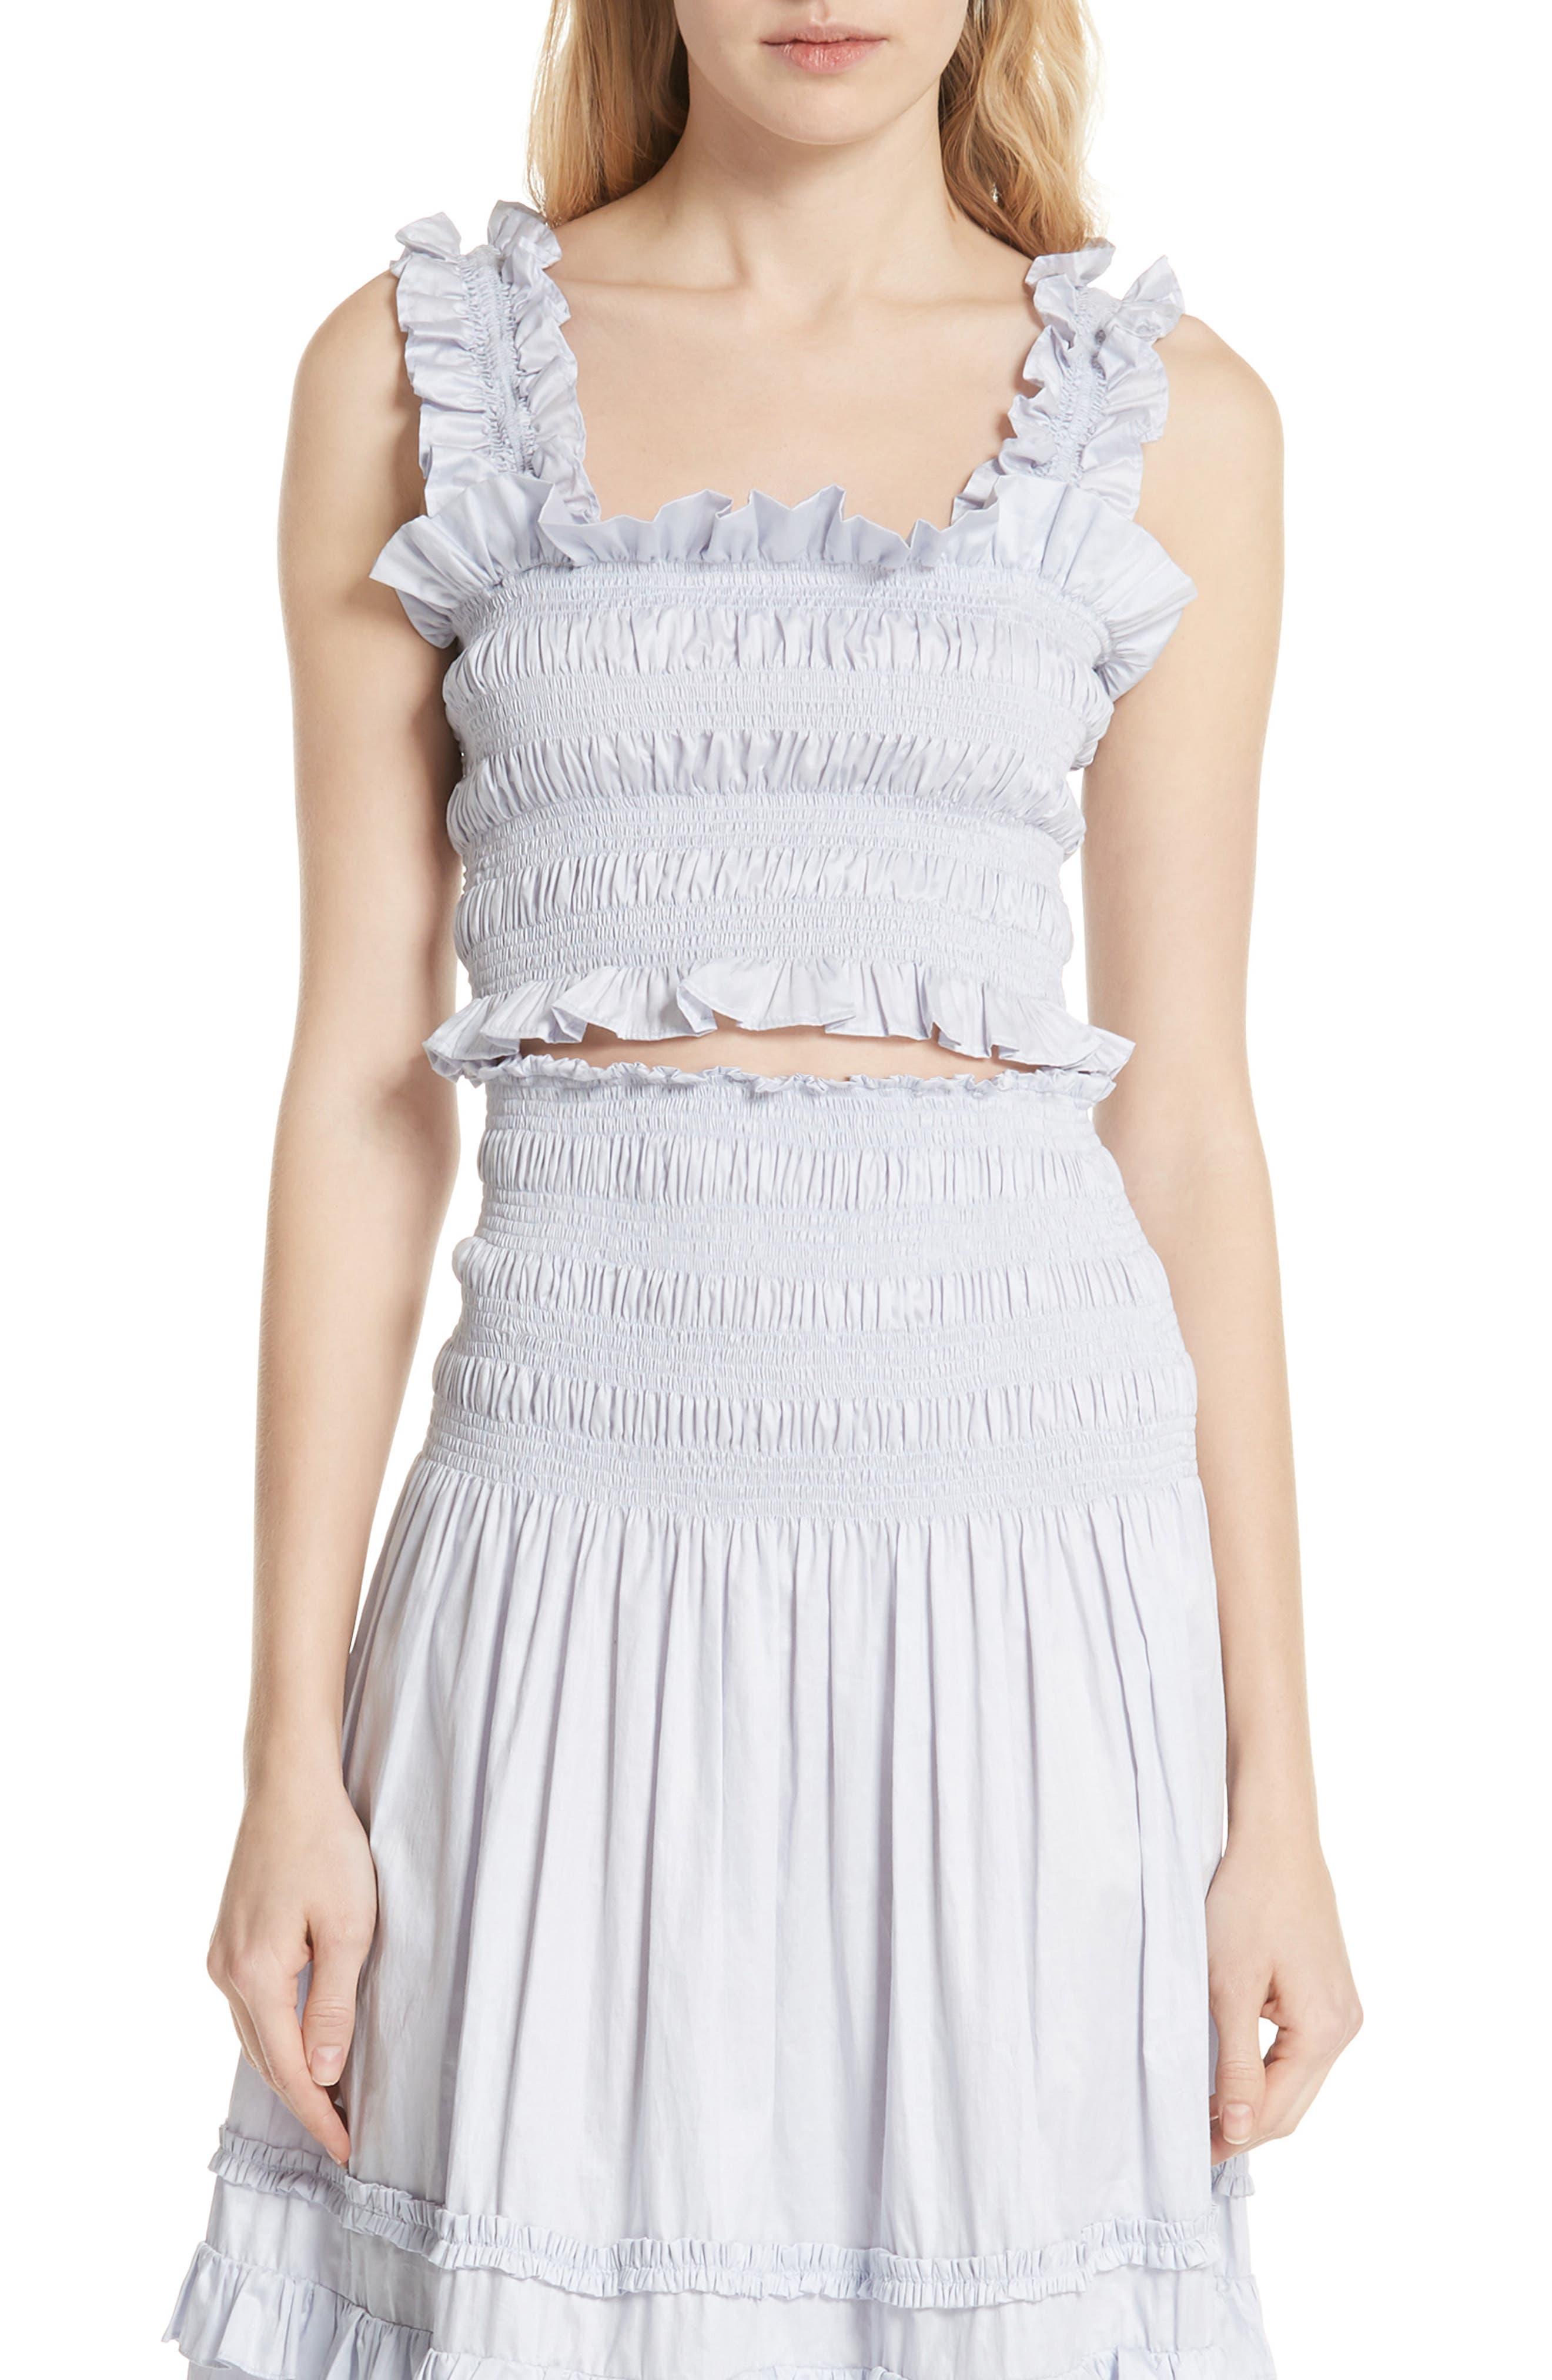 Main Image - Rebecca Taylor Smocked Sleeveless Cotton Top